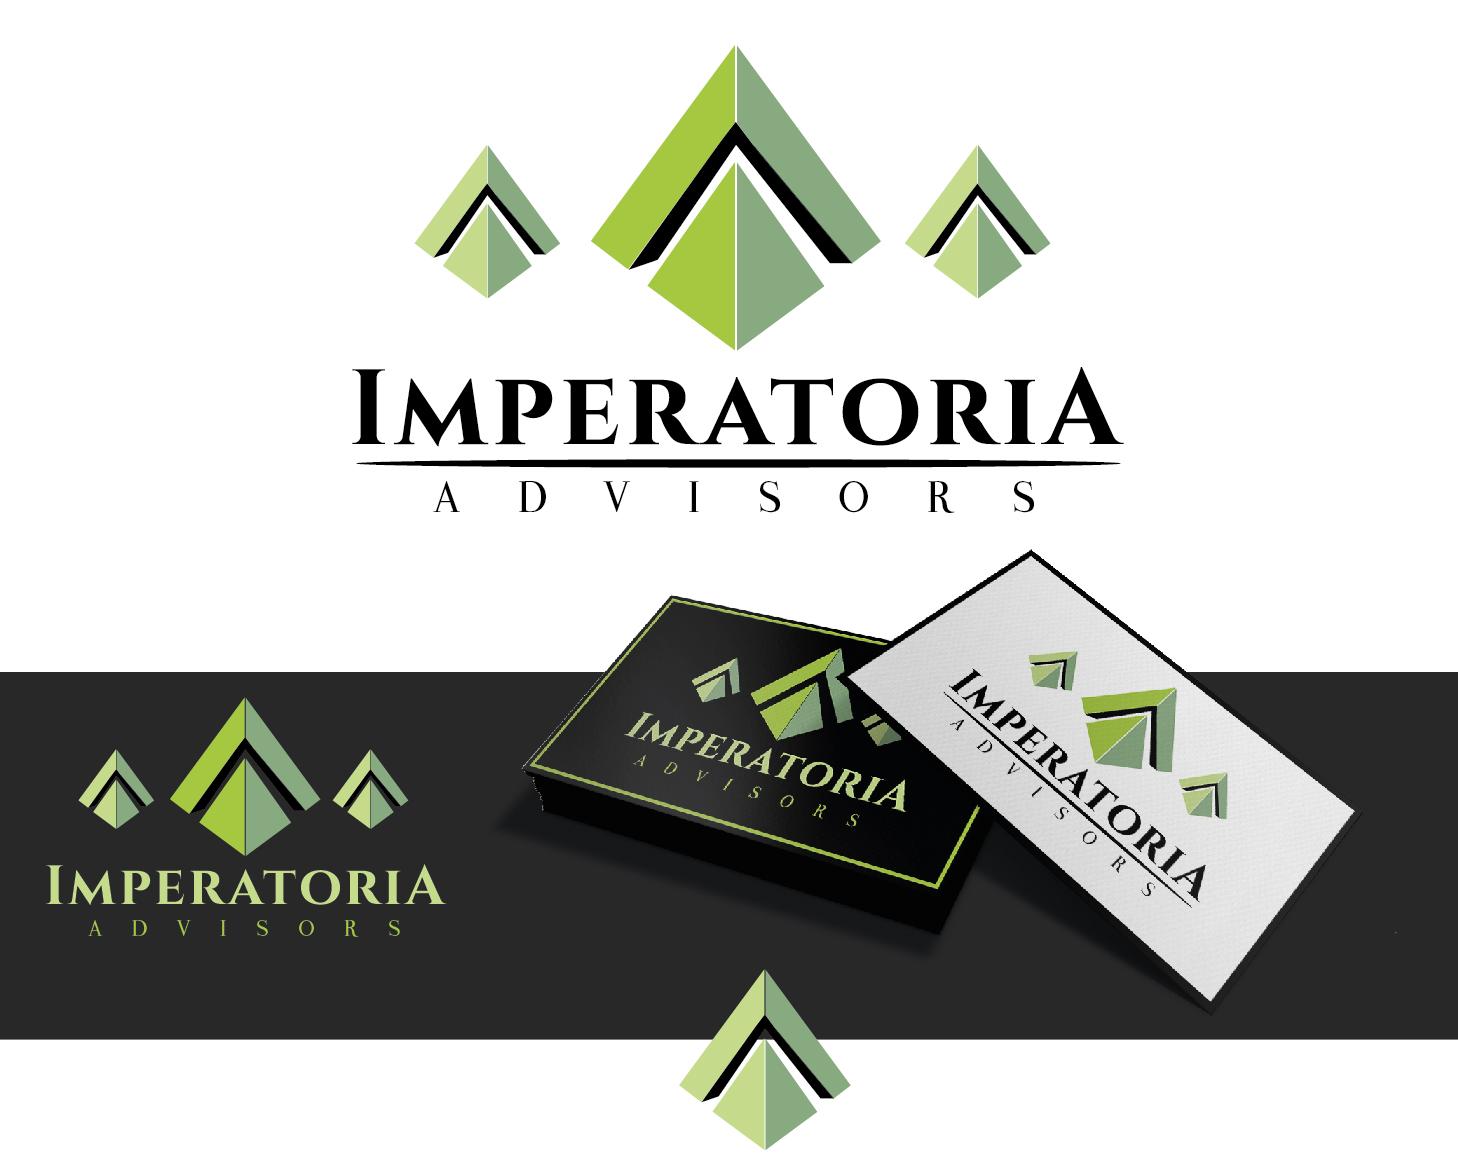 Logo Design by VENTSISLAV KOVACHEV - Entry No. 87 in the Logo Design Contest Unique Logo Design Wanted for Imperatoria Advisors.